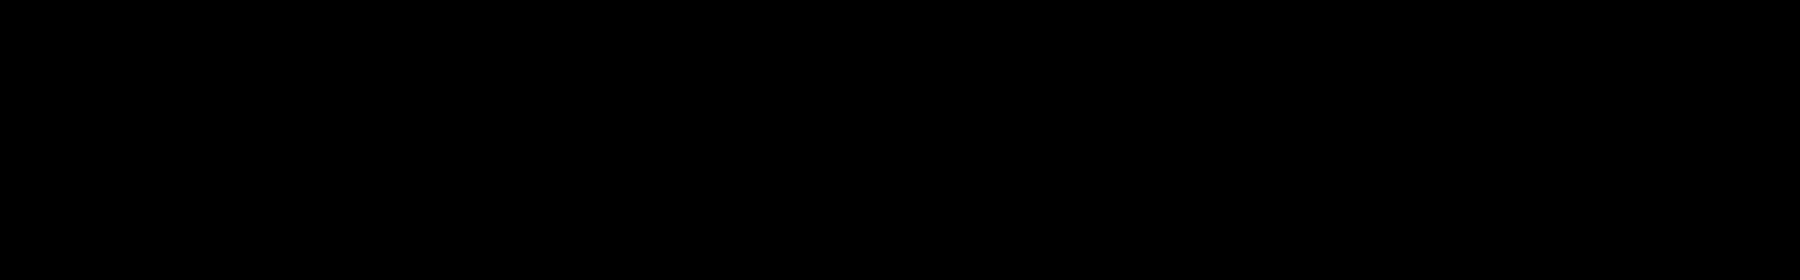 Tomorrowland EDM 2016 audio waveform